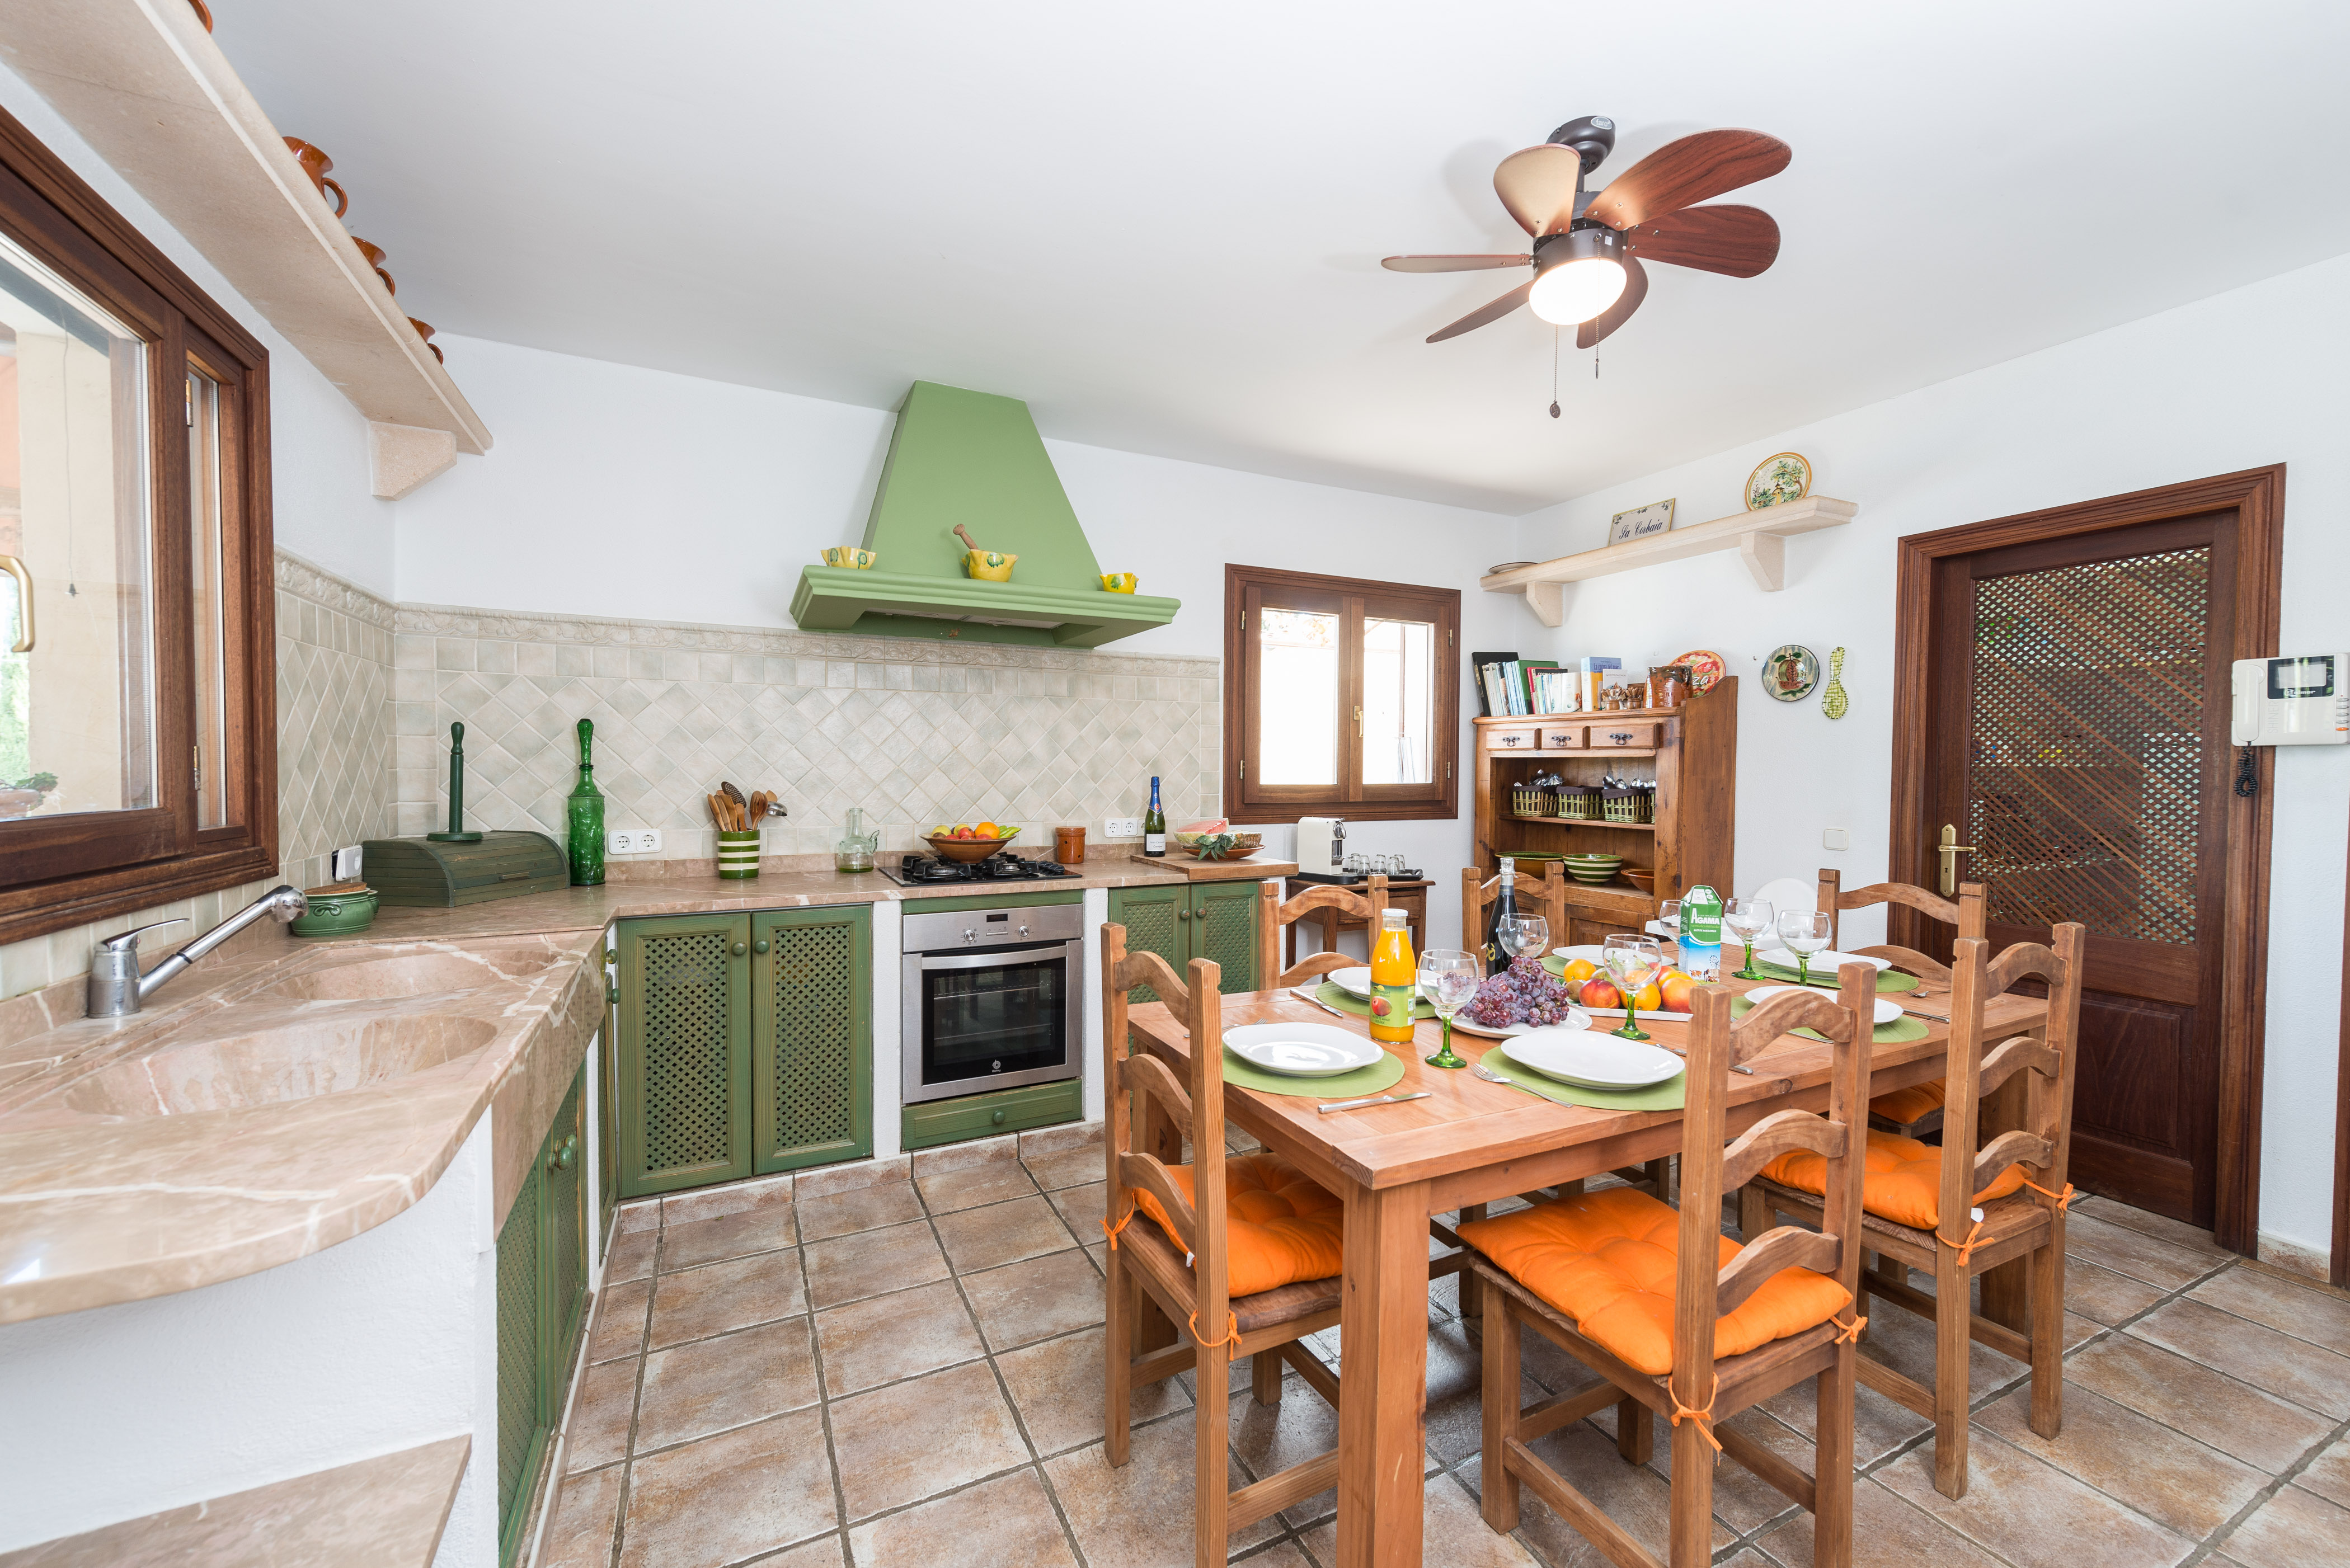 Ferienhaus SA CORBAIA (2020559), Arta, Mallorca, Balearische Inseln, Spanien, Bild 20